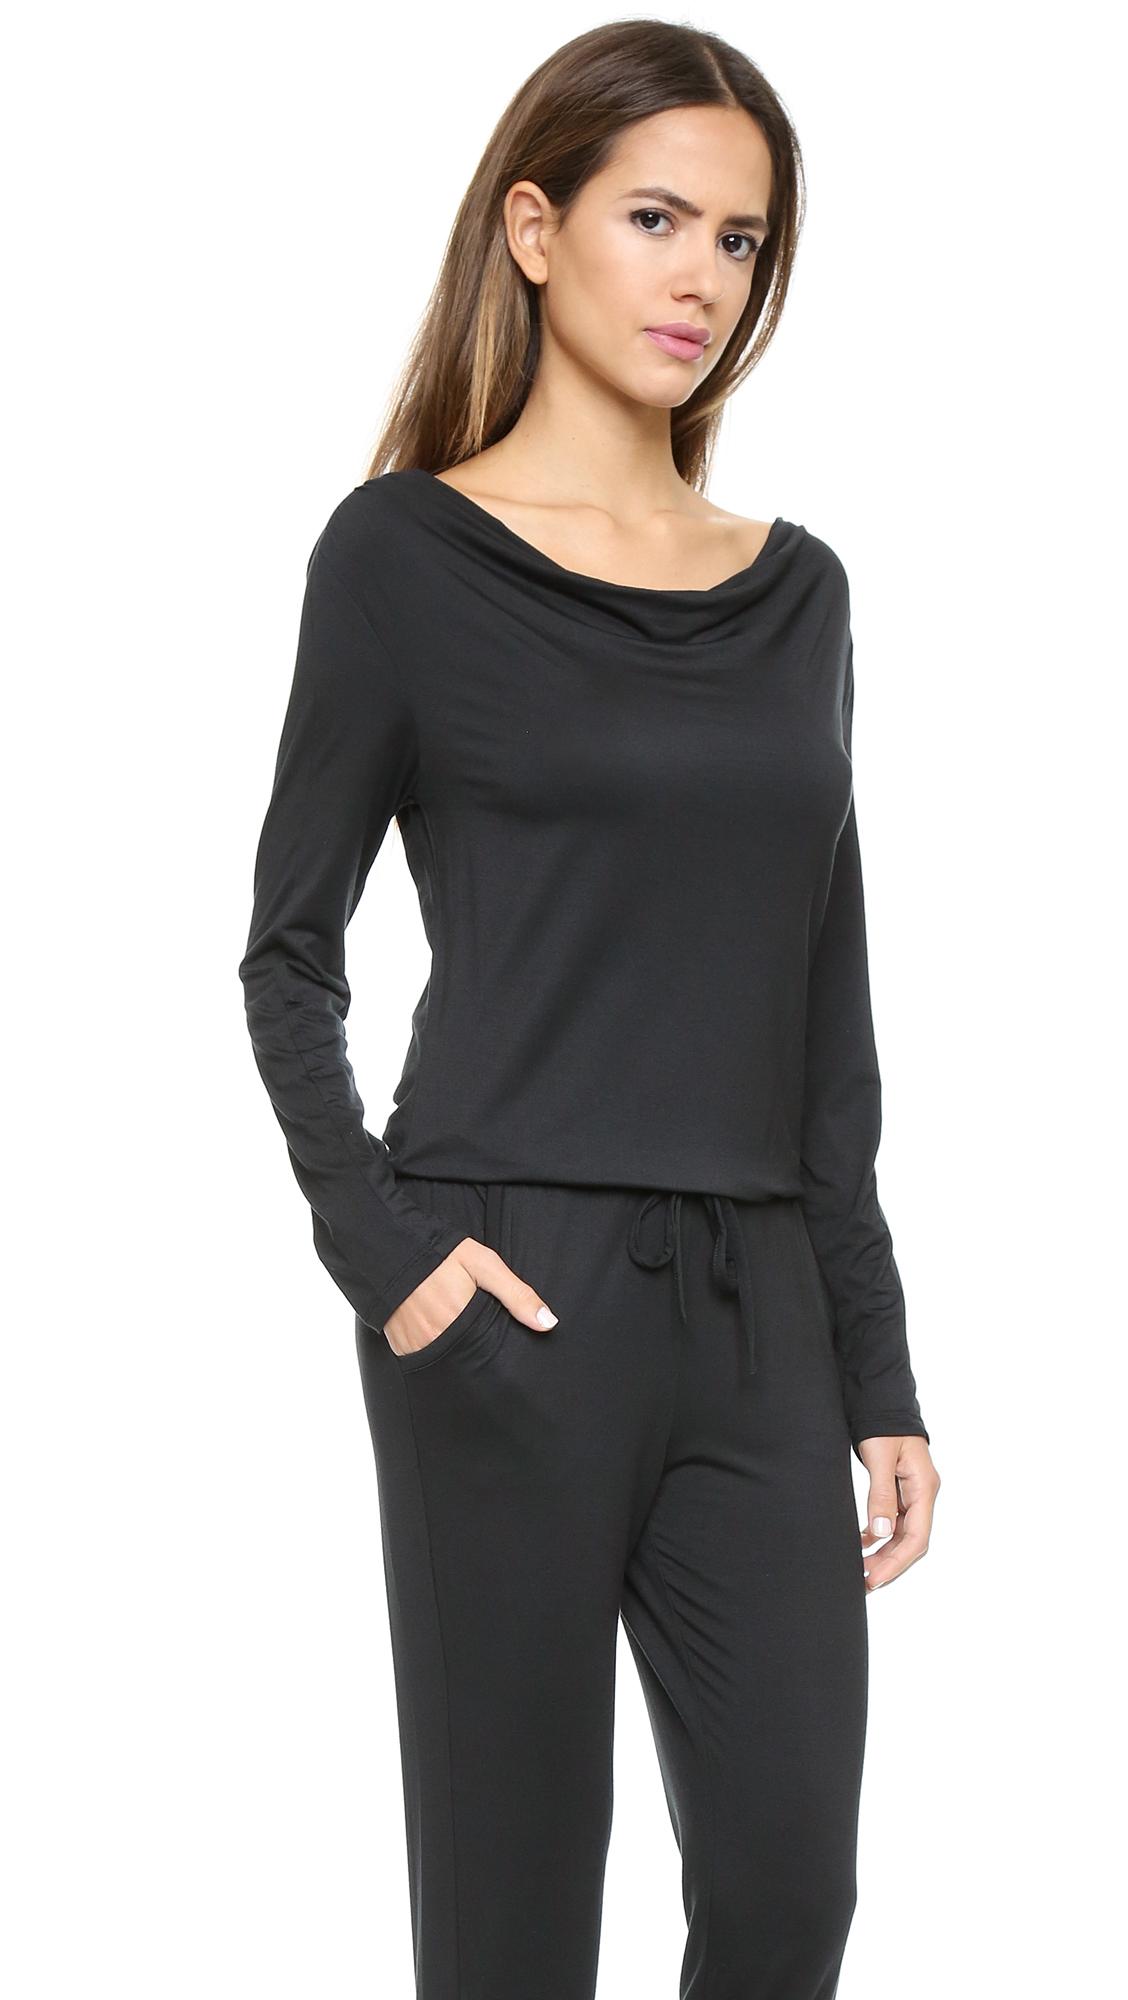 a53cd72ee30 Lyst - Calvin Klein Edge Jumpsuit - Light Grey Heather in Black